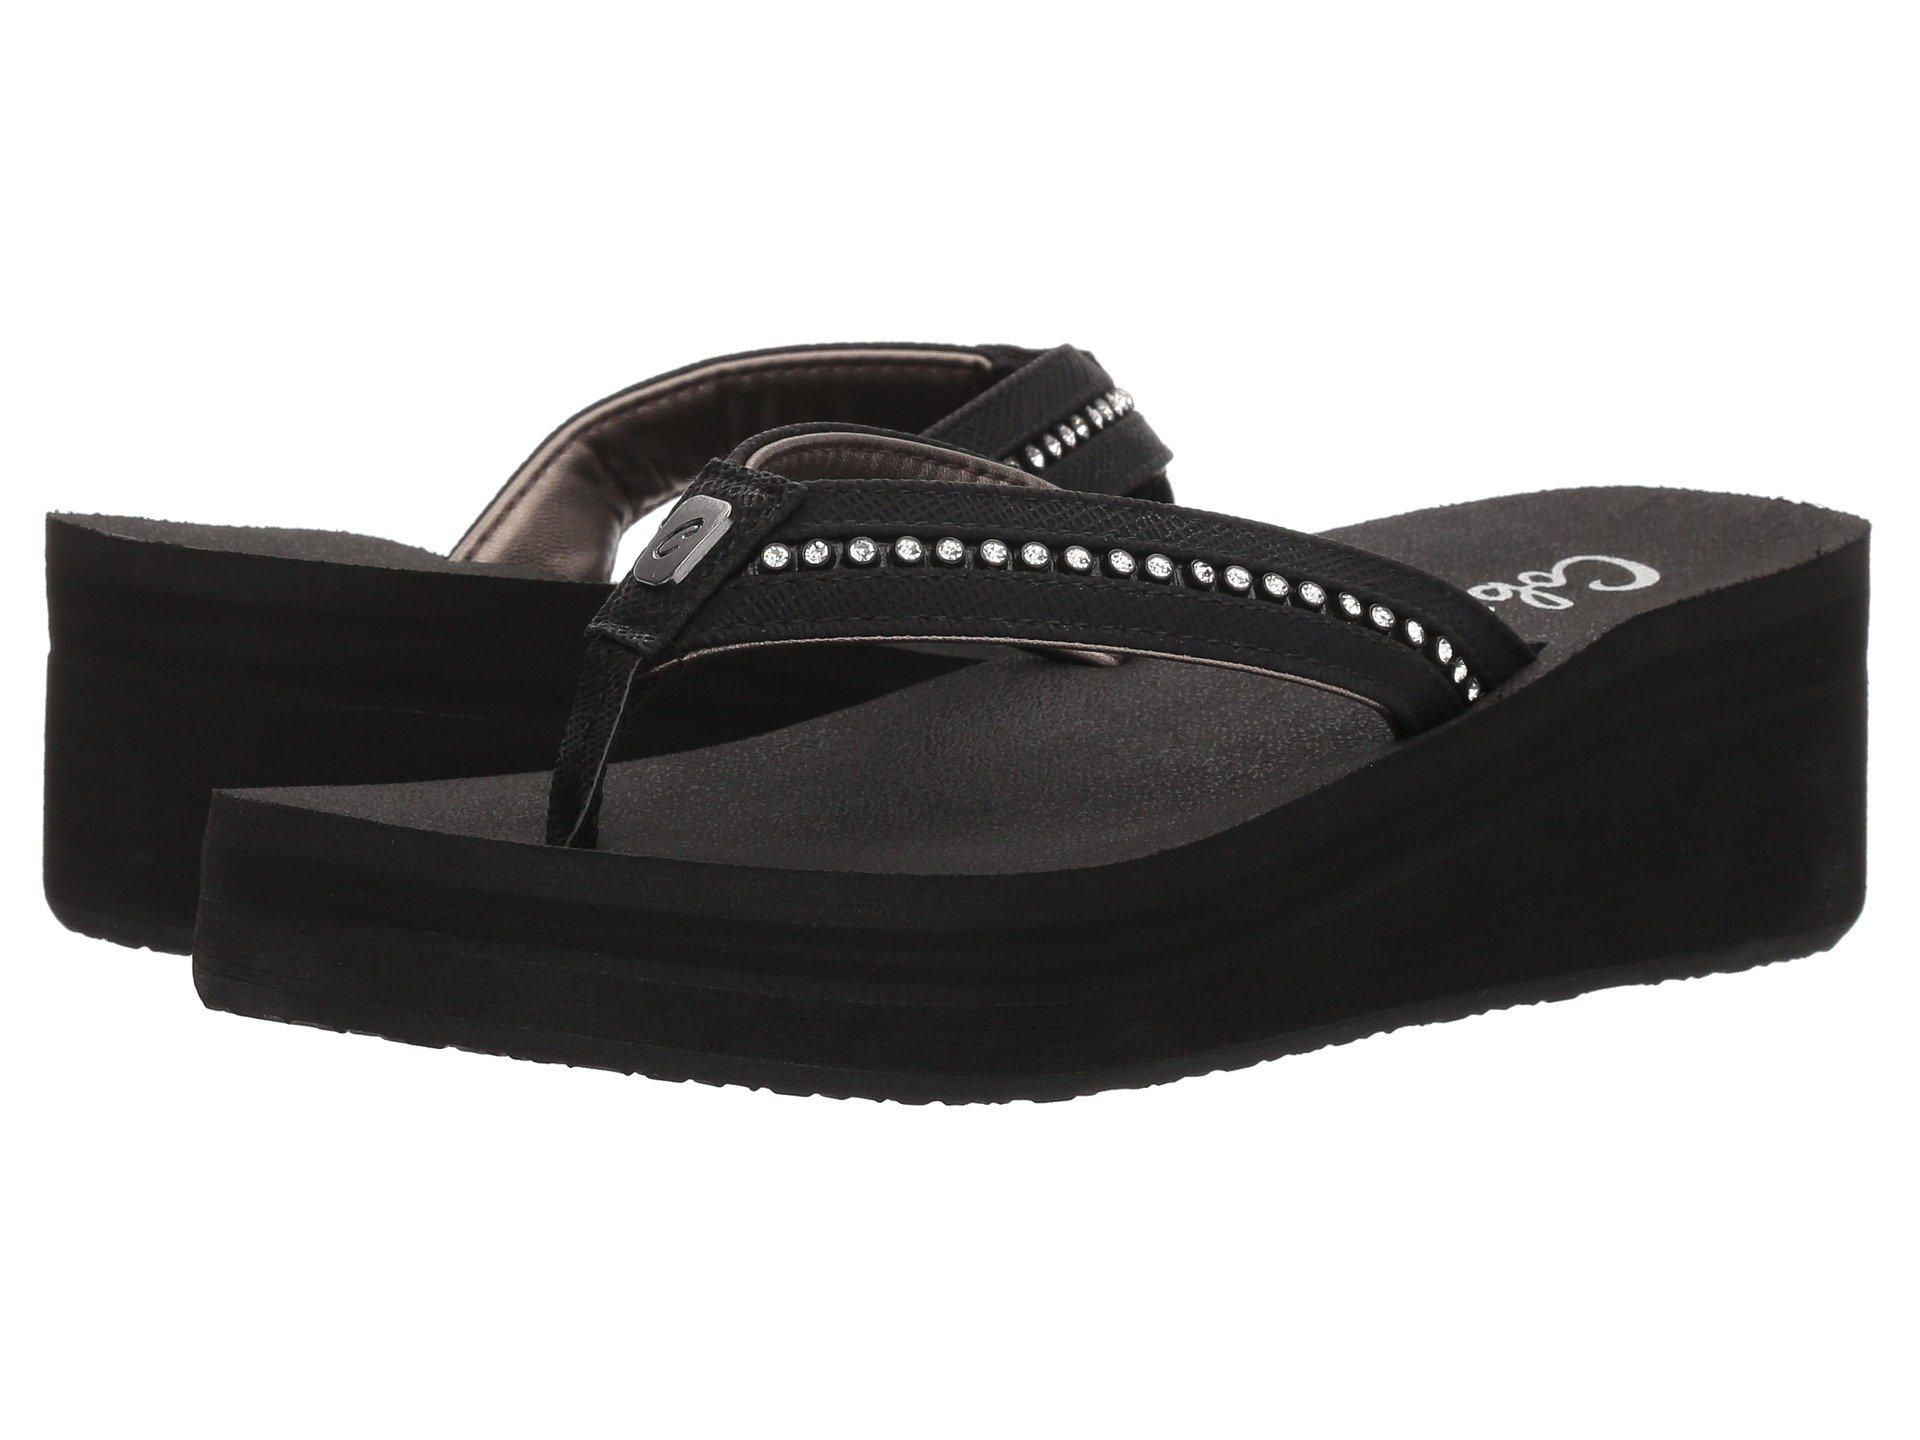 52748e7c4 Lyst - Cobian Tiffany Ii (gold) Women s Sandals in Black